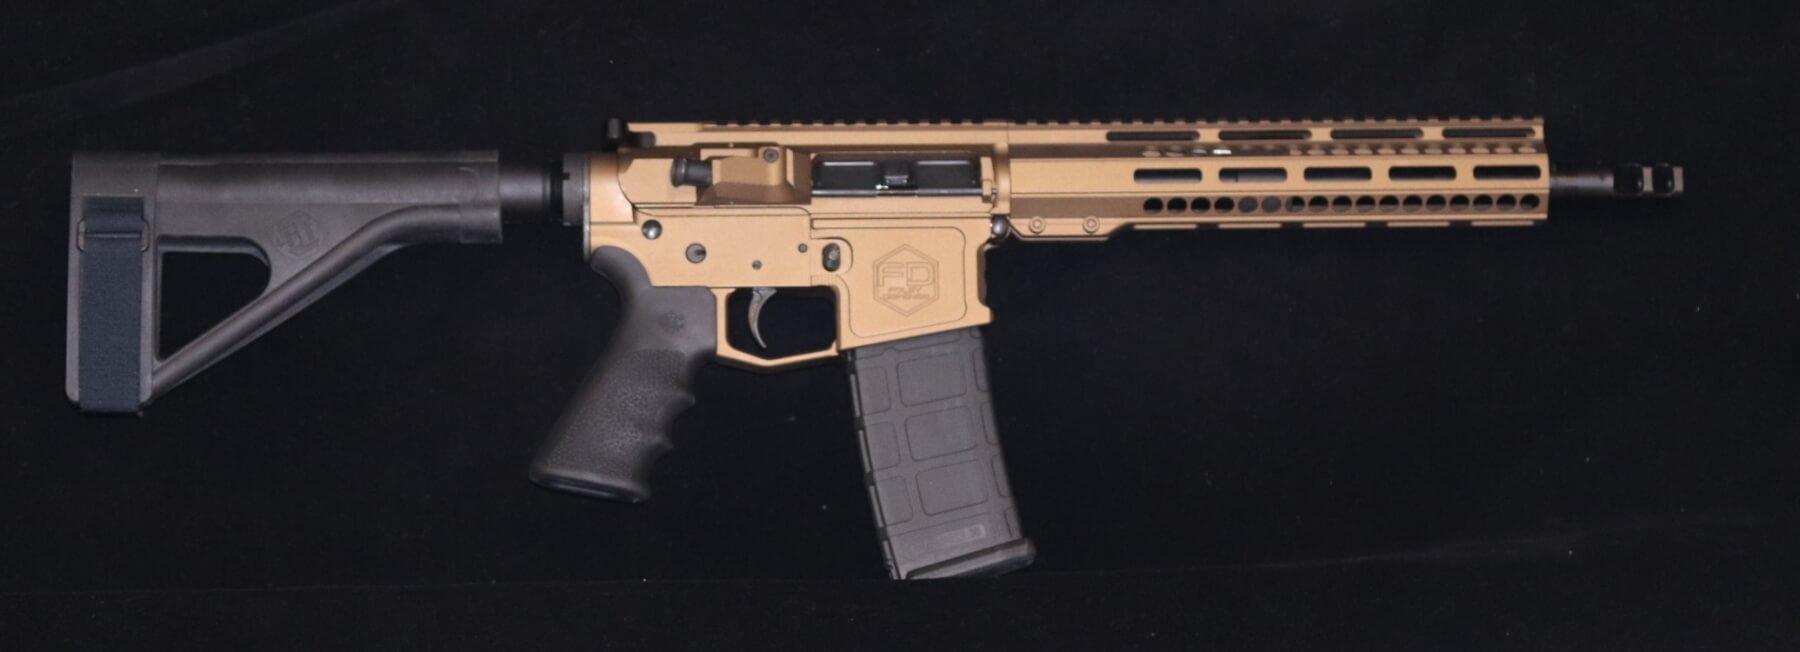 Foley Defense Fd 15 Pistol Foley Defense